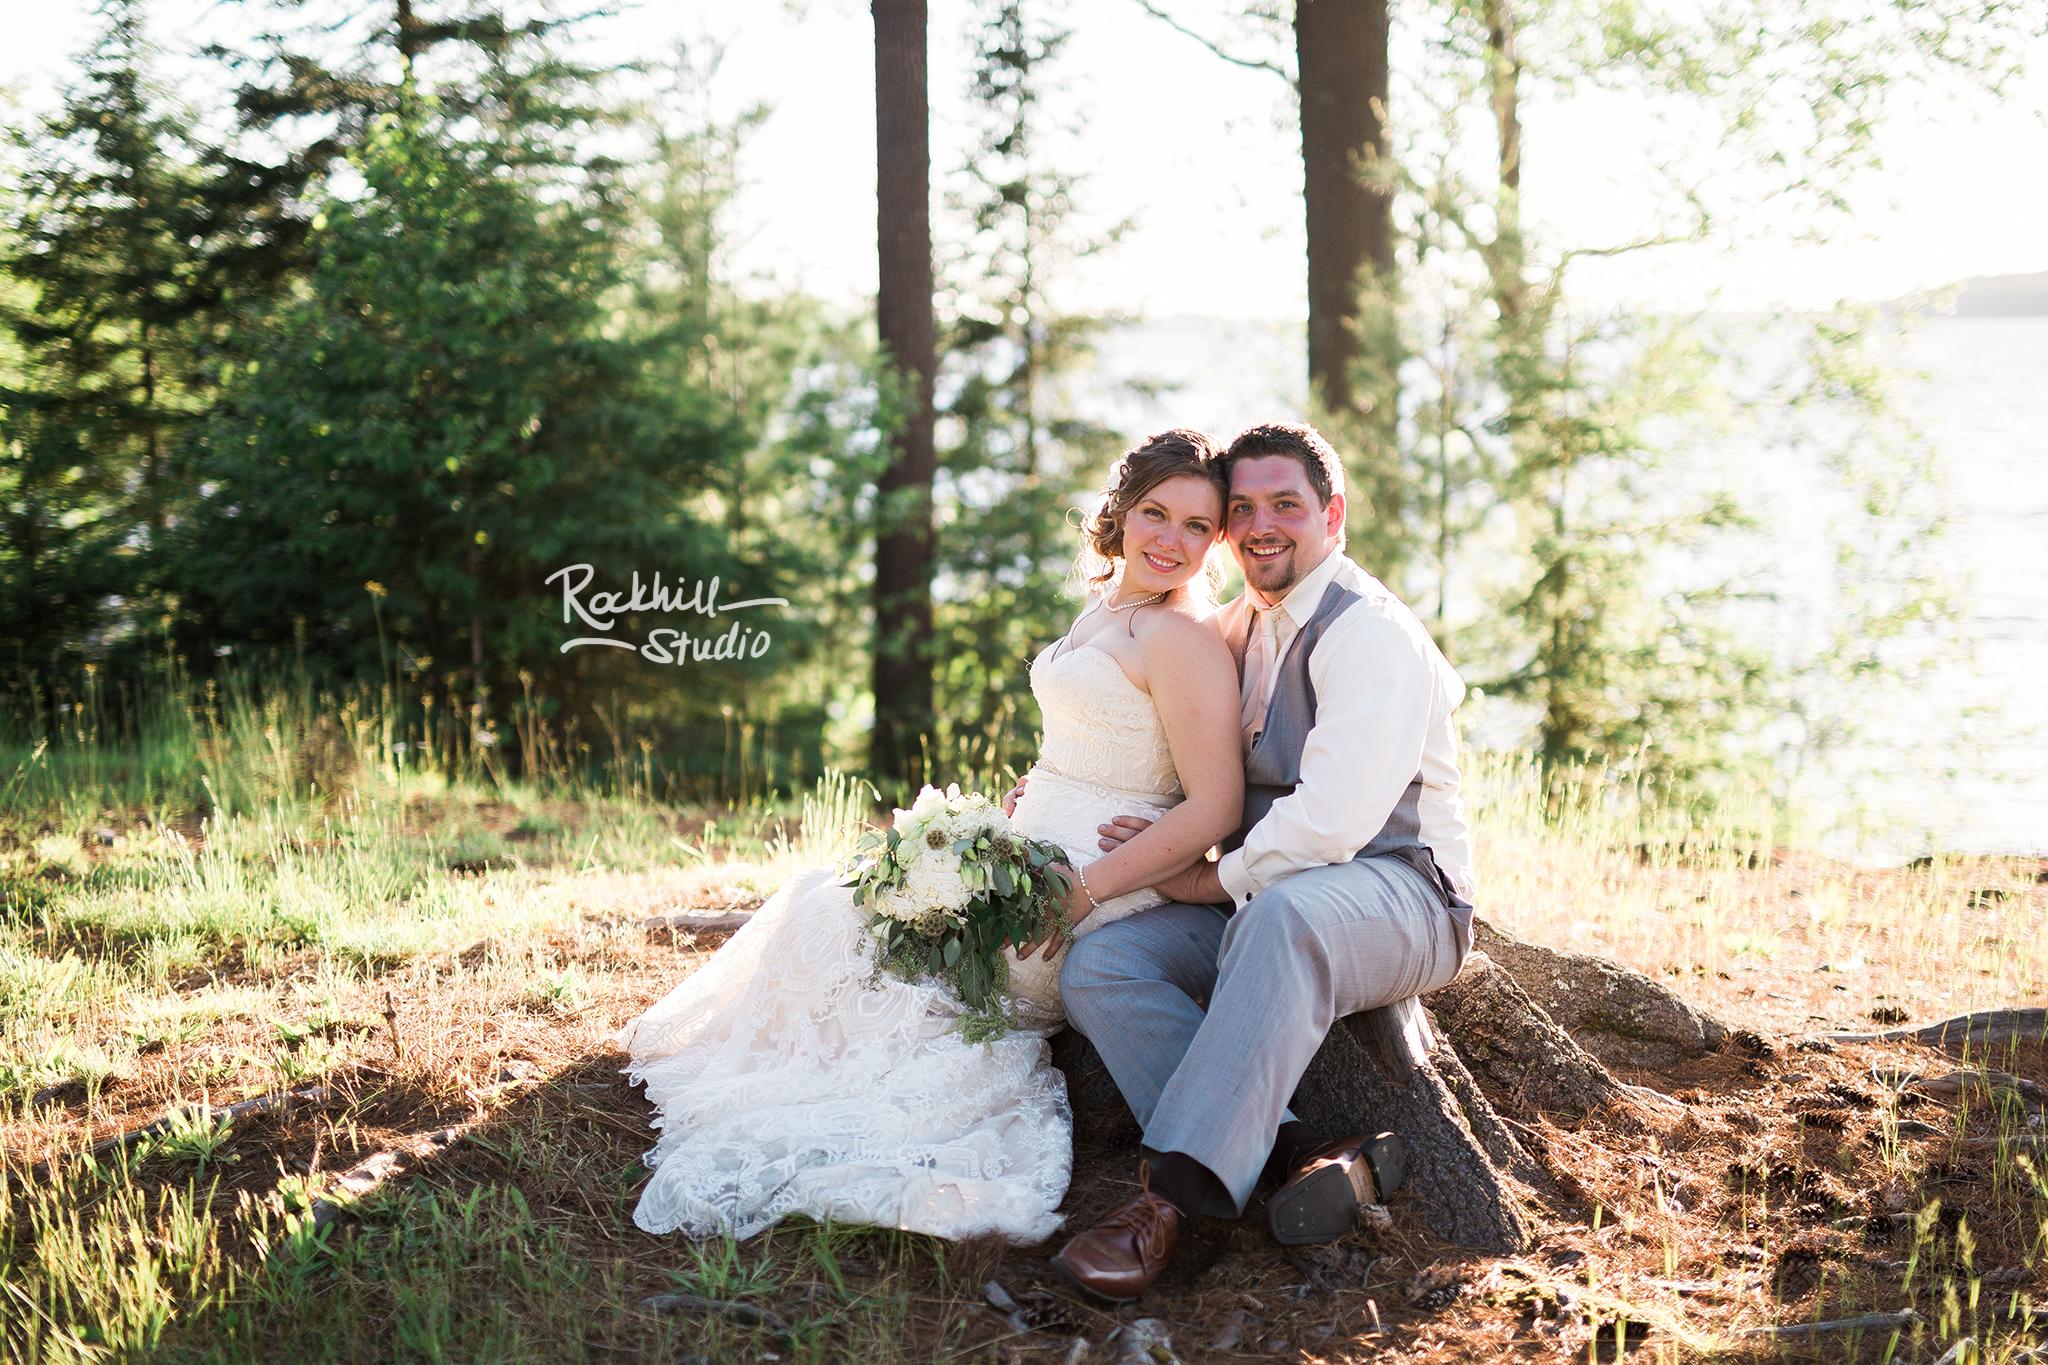 van-riper-state-park-wedding-photography-rockhill-studio-upper-peninsula-1.jpg